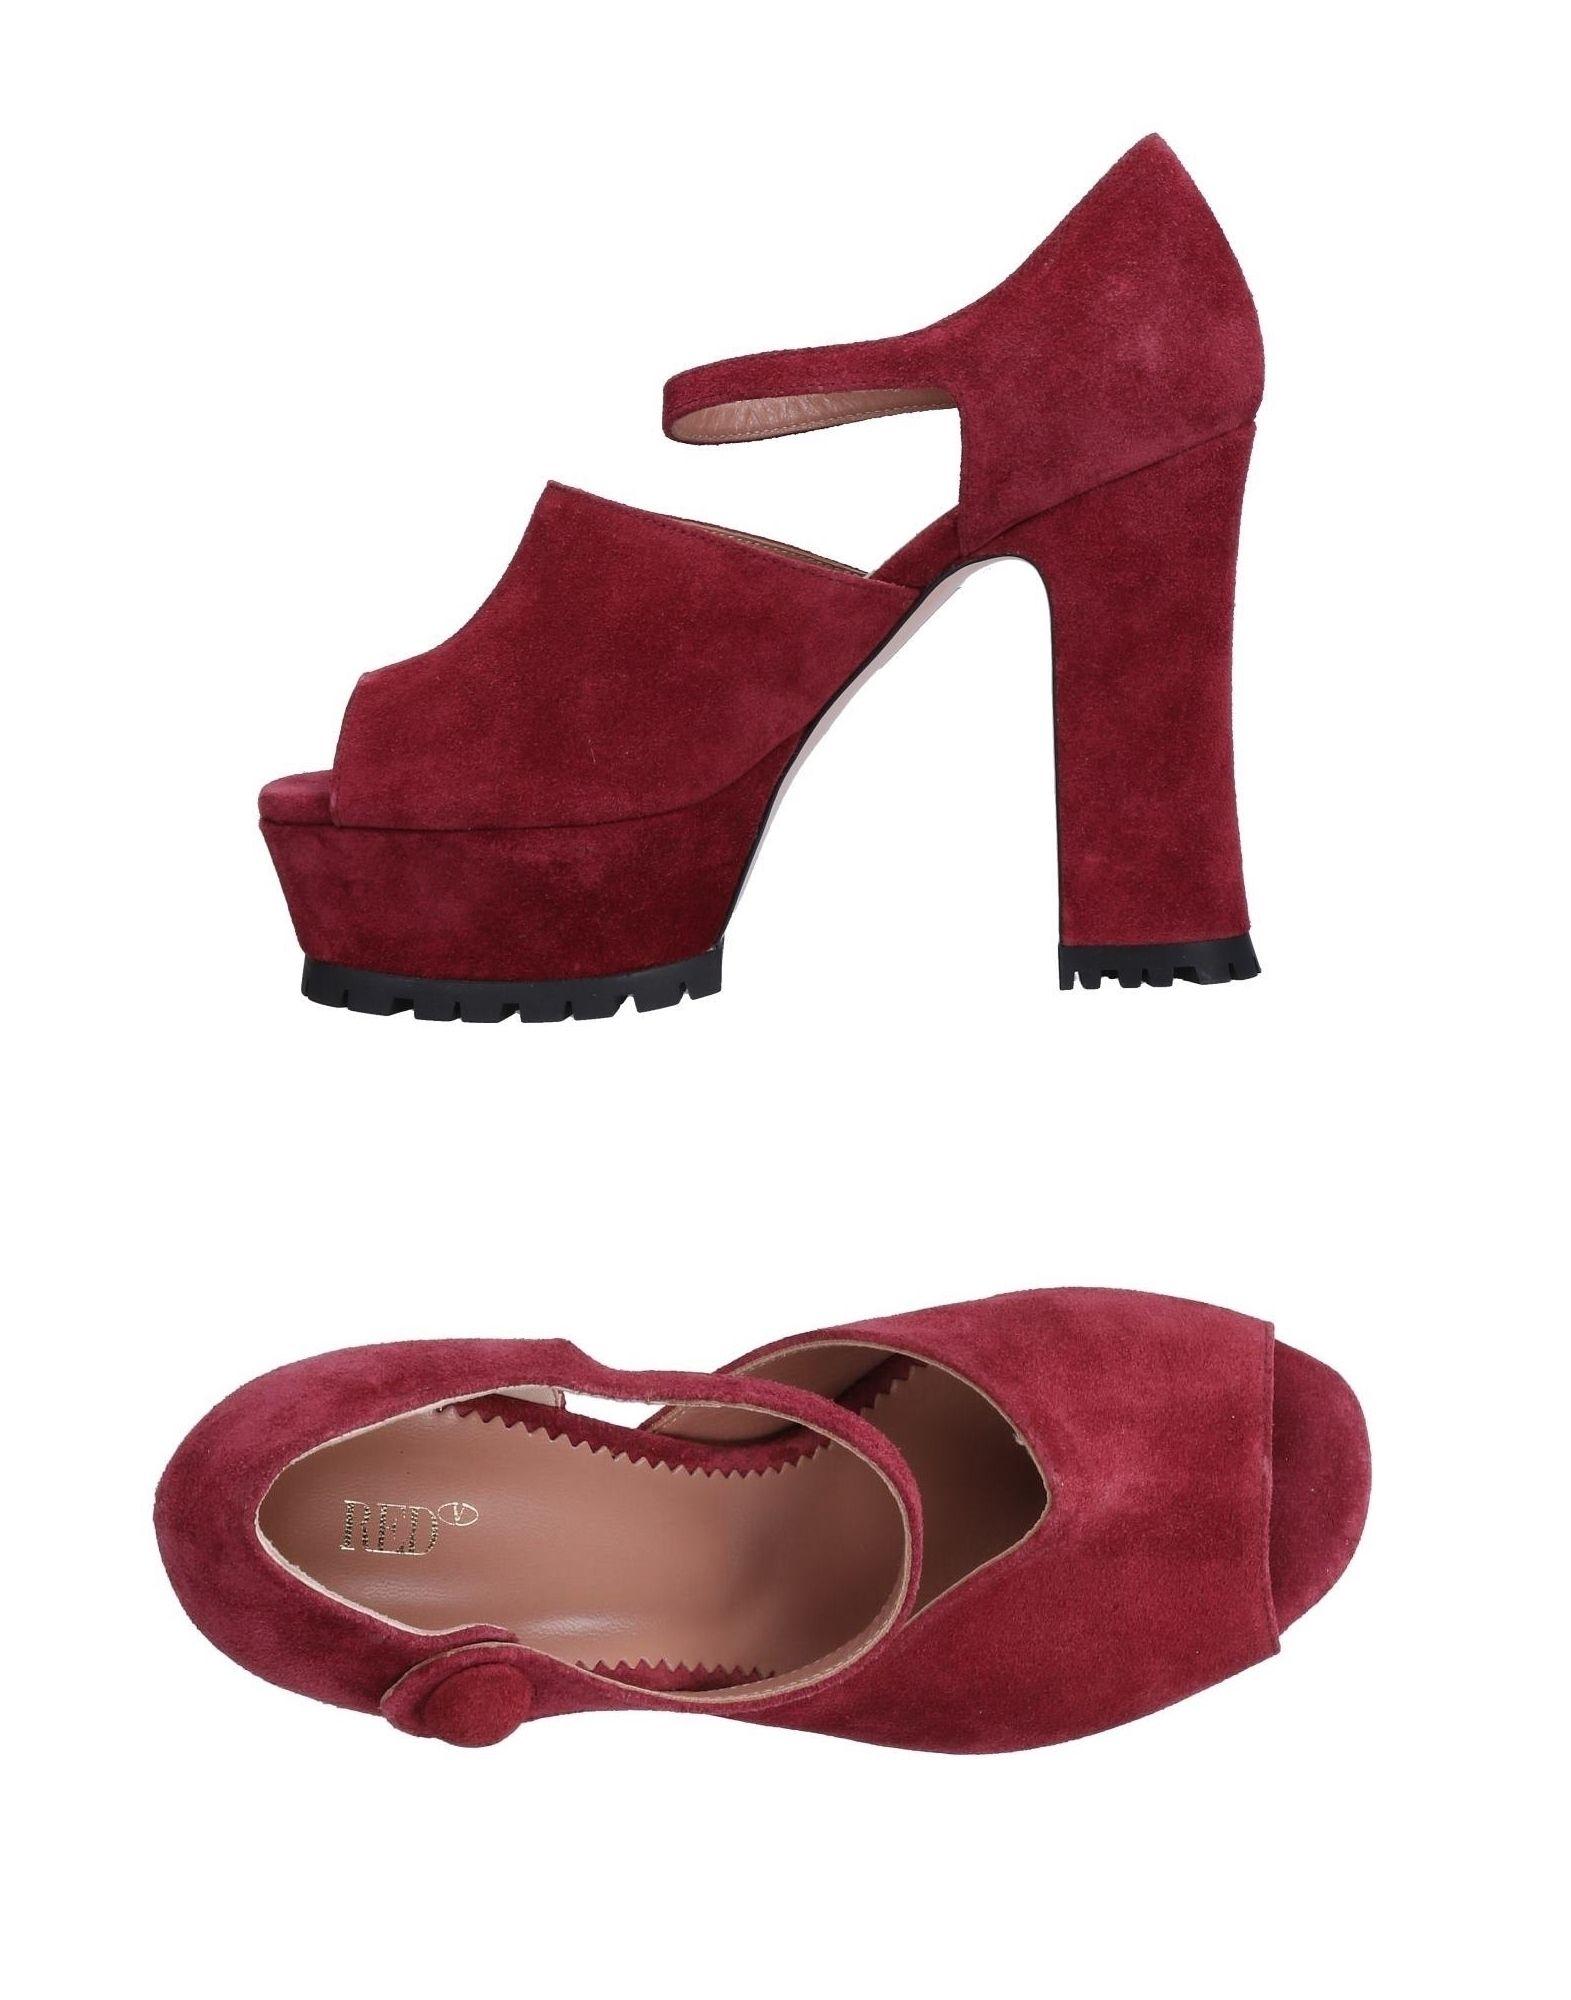 Moda Sandali Red(V) Donna - 11267842SL